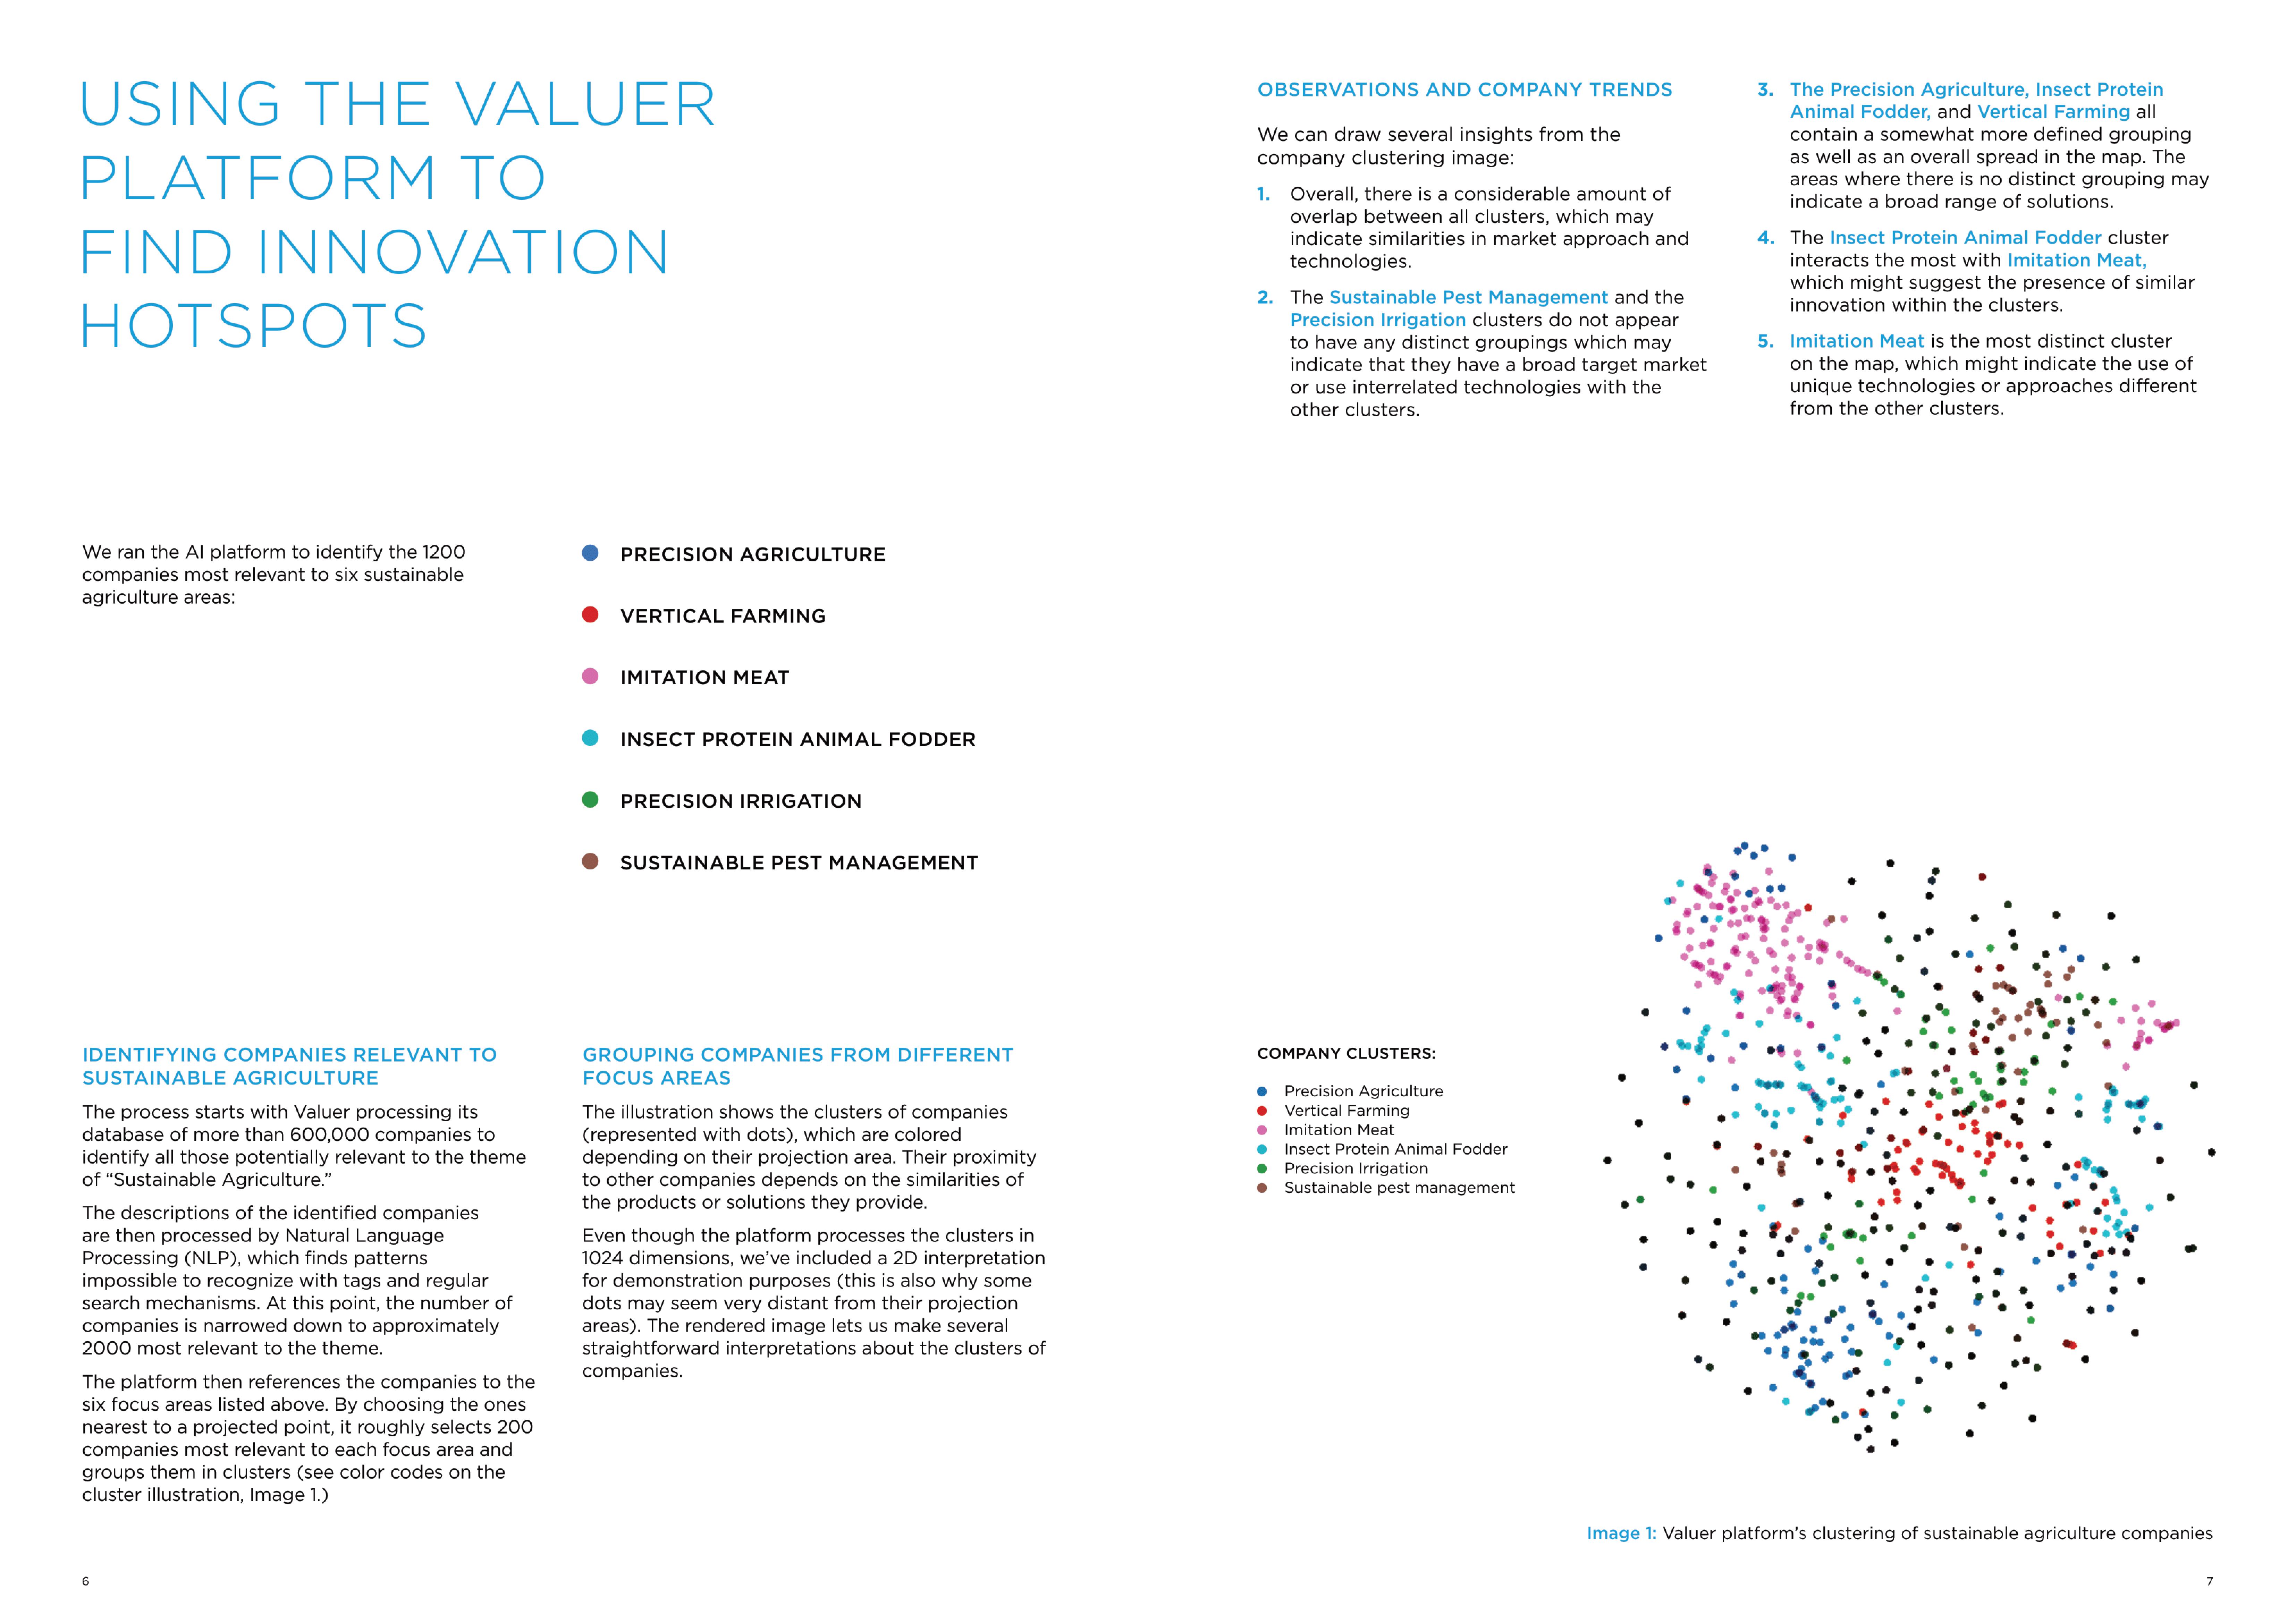 How Valuers platform uses AI